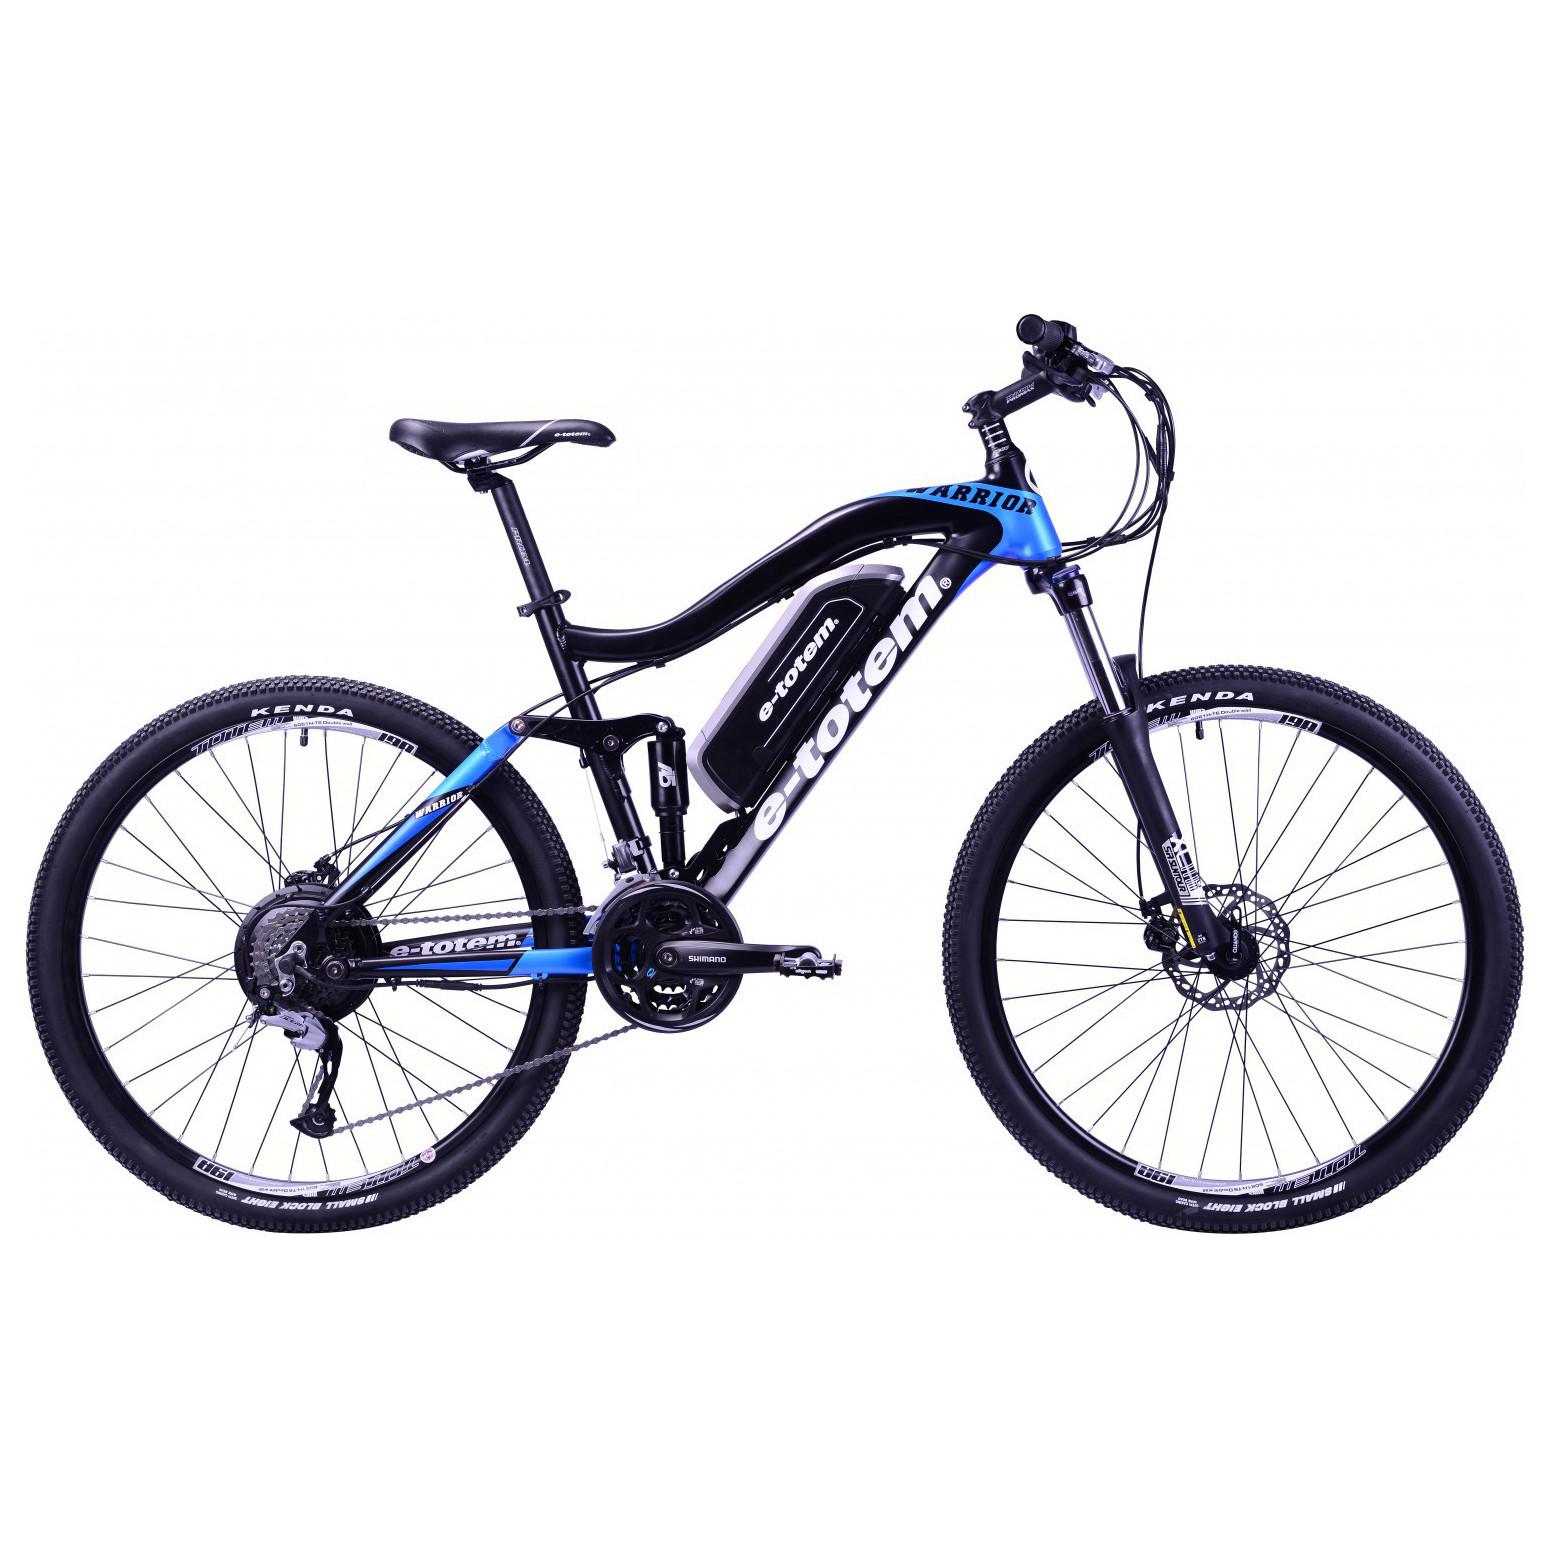 e bike mountainbike full suspension e totem. Black Bedroom Furniture Sets. Home Design Ideas